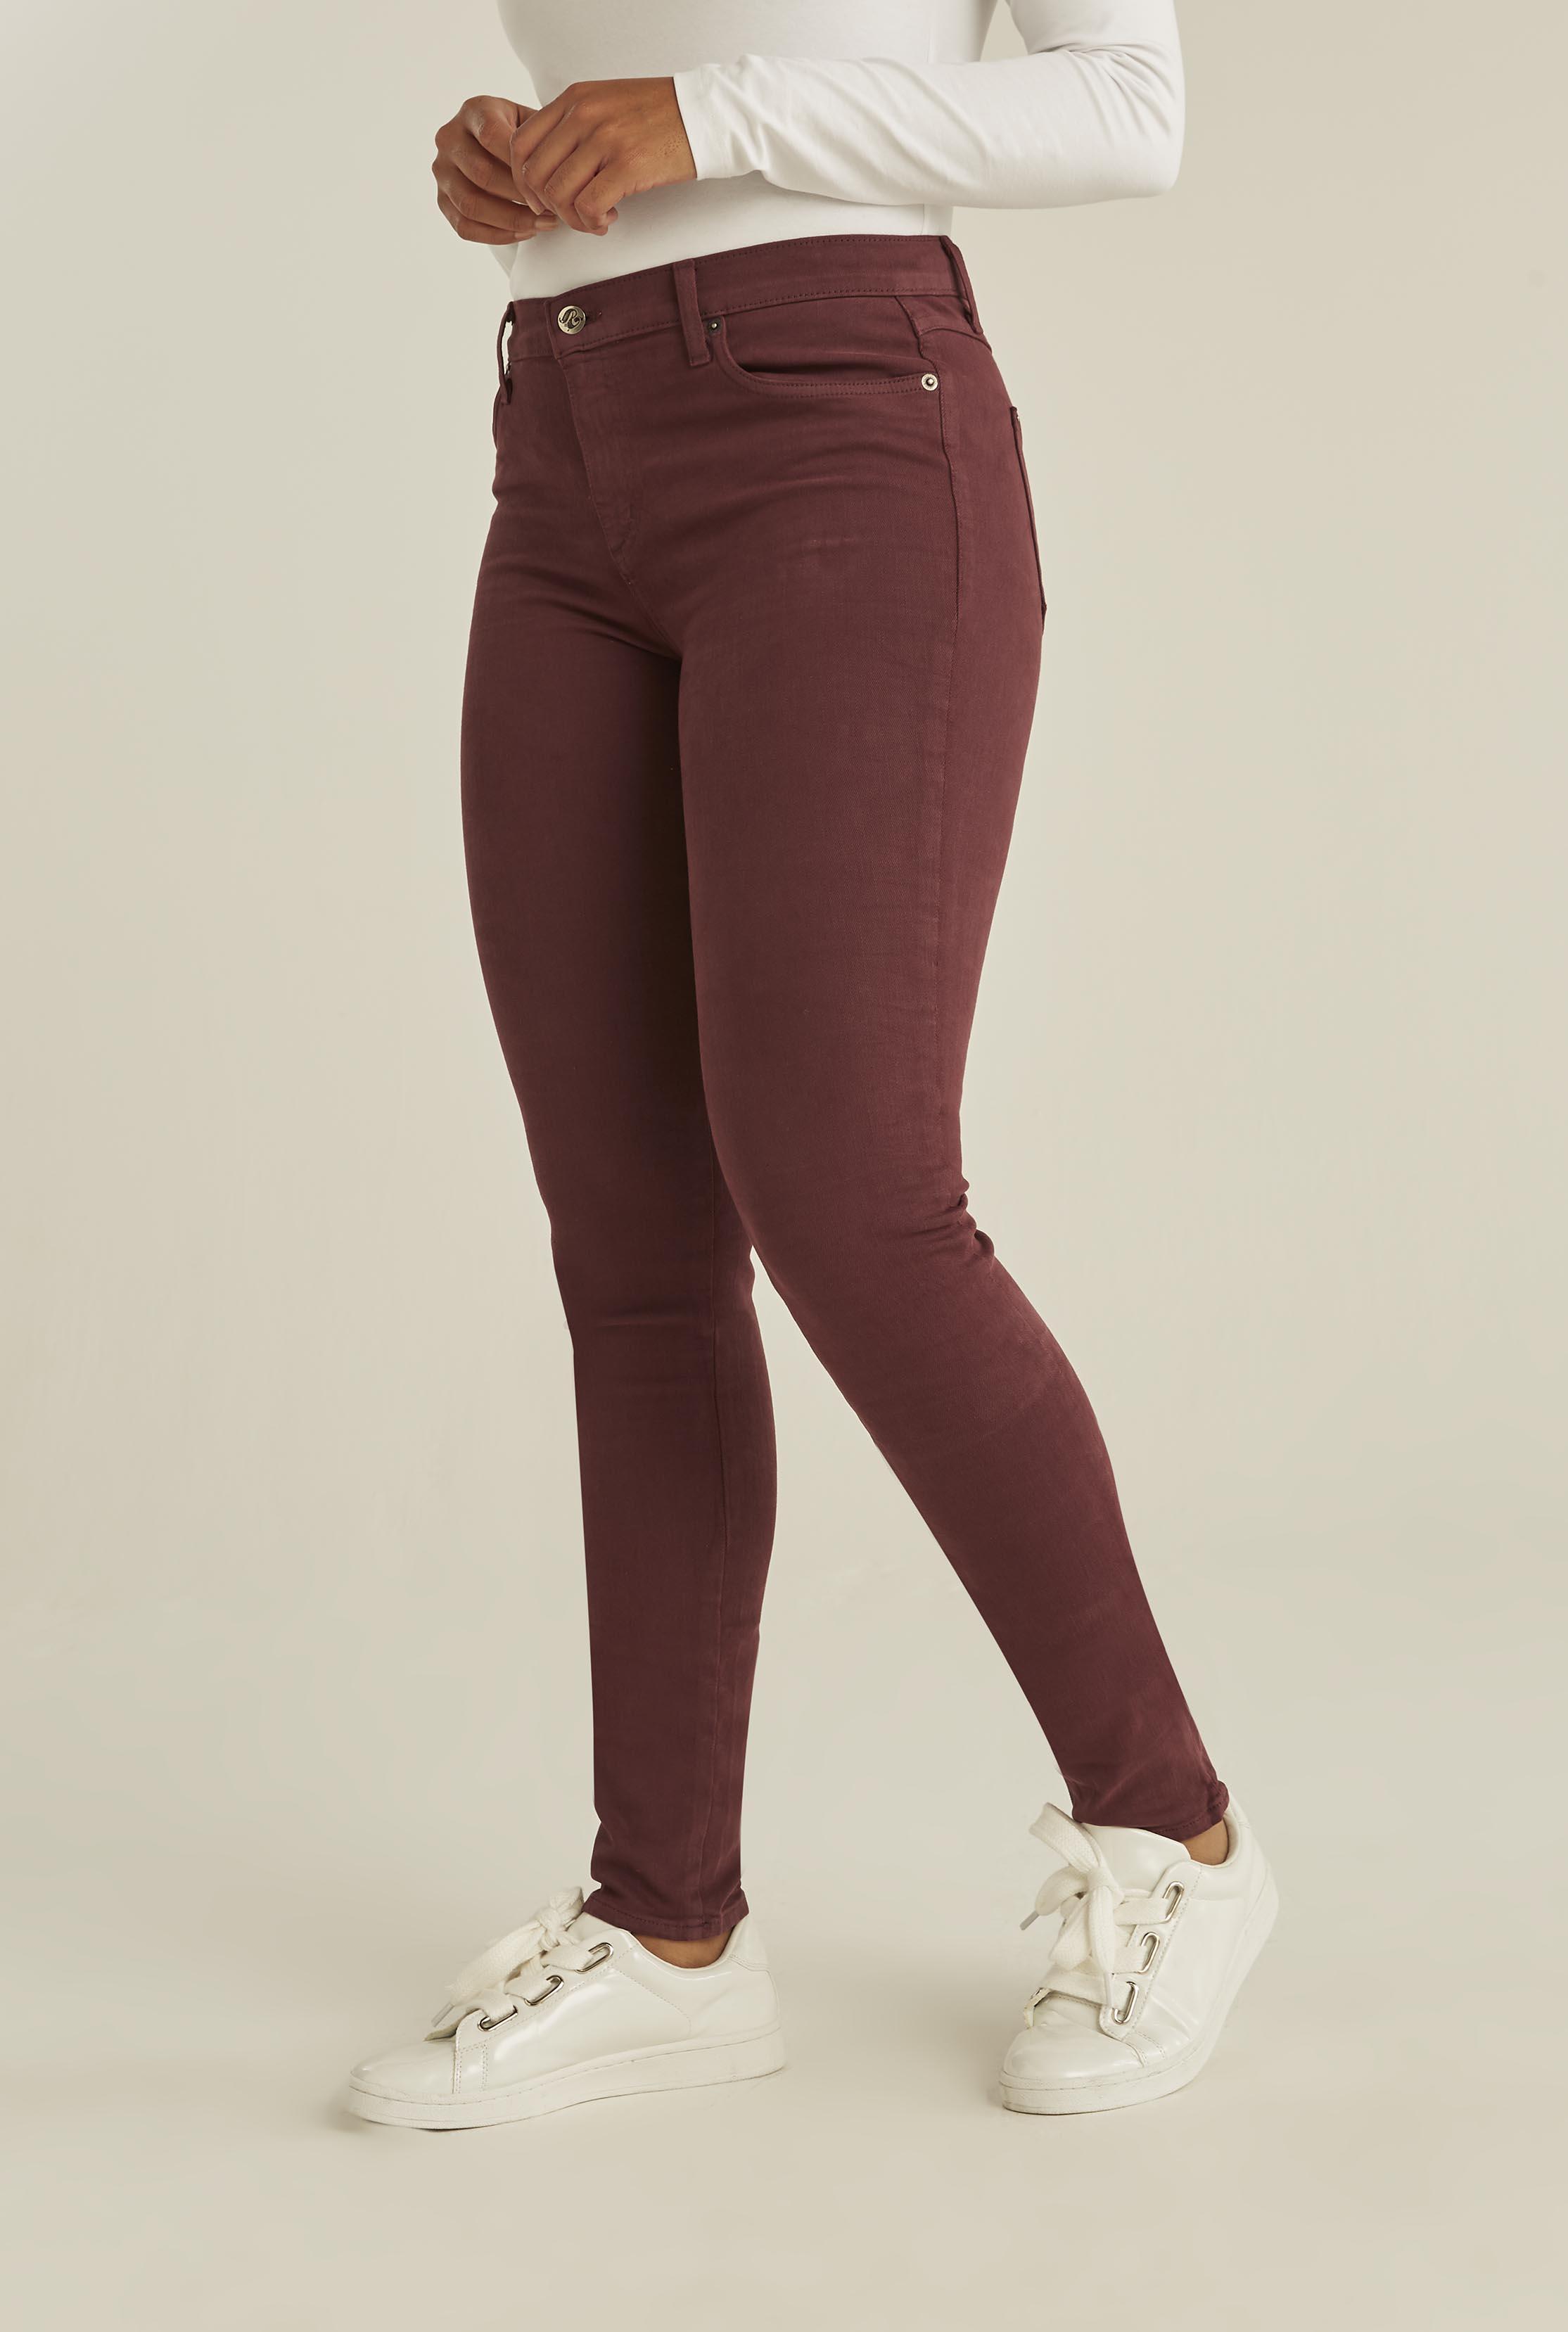 YOGA JEANS Rachel Skinny Jeans